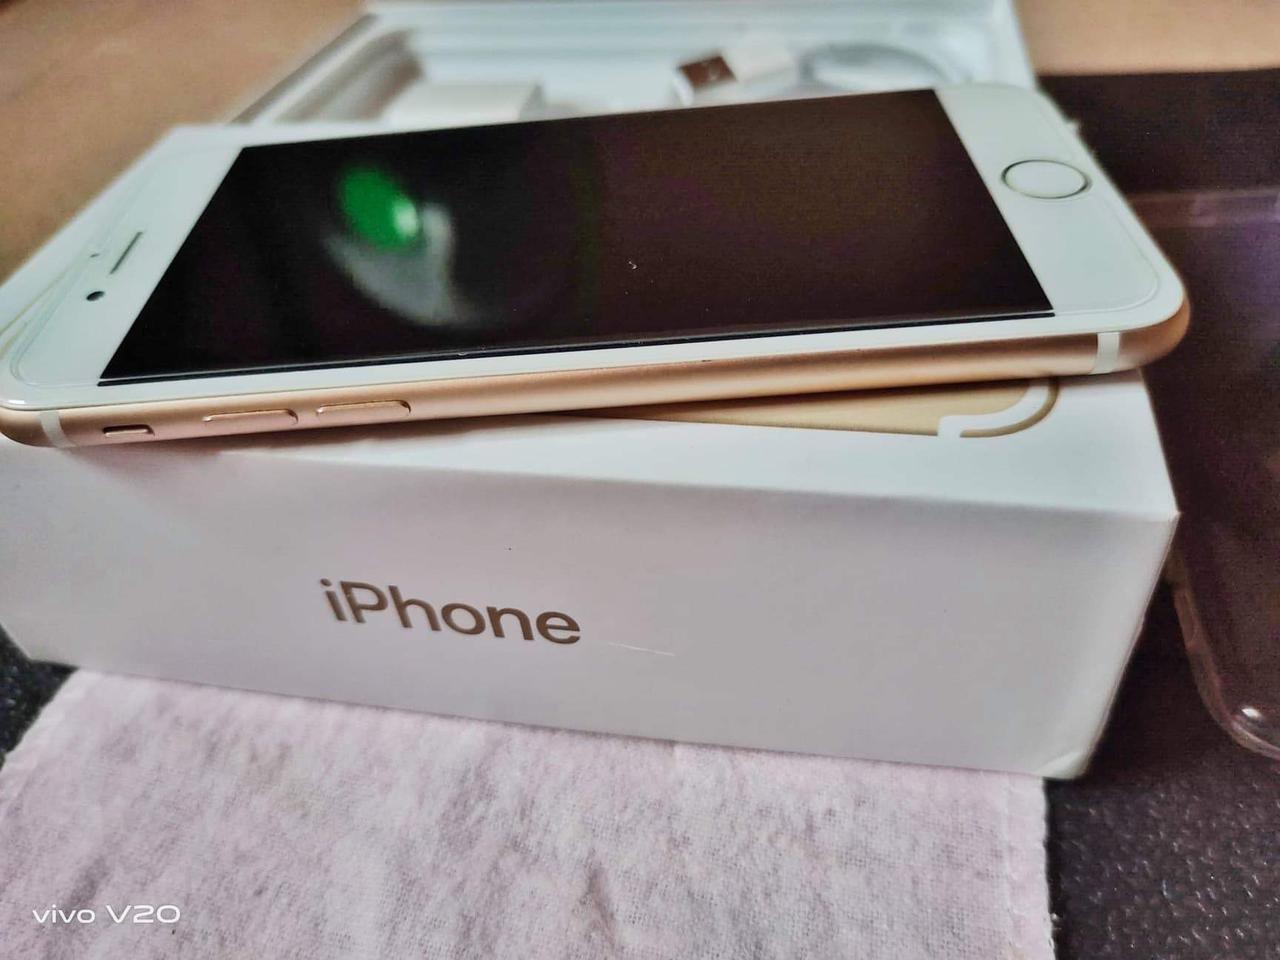 iPhone7 มือสอง 128G สีทอง รูปที่ 4